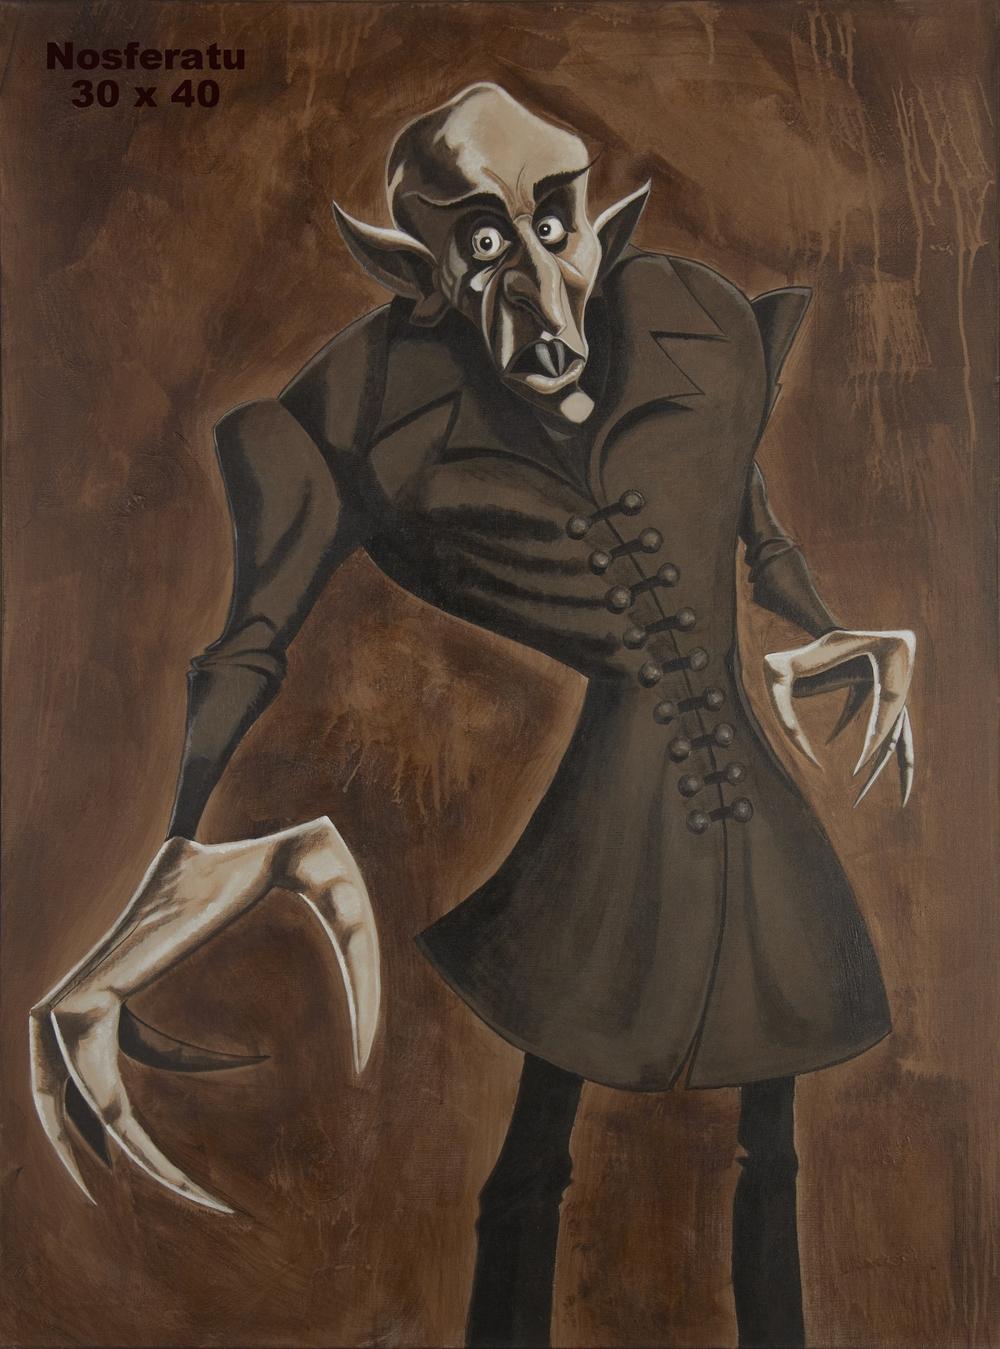 Tasiir Final Nosferatu IMG_068506.jpg